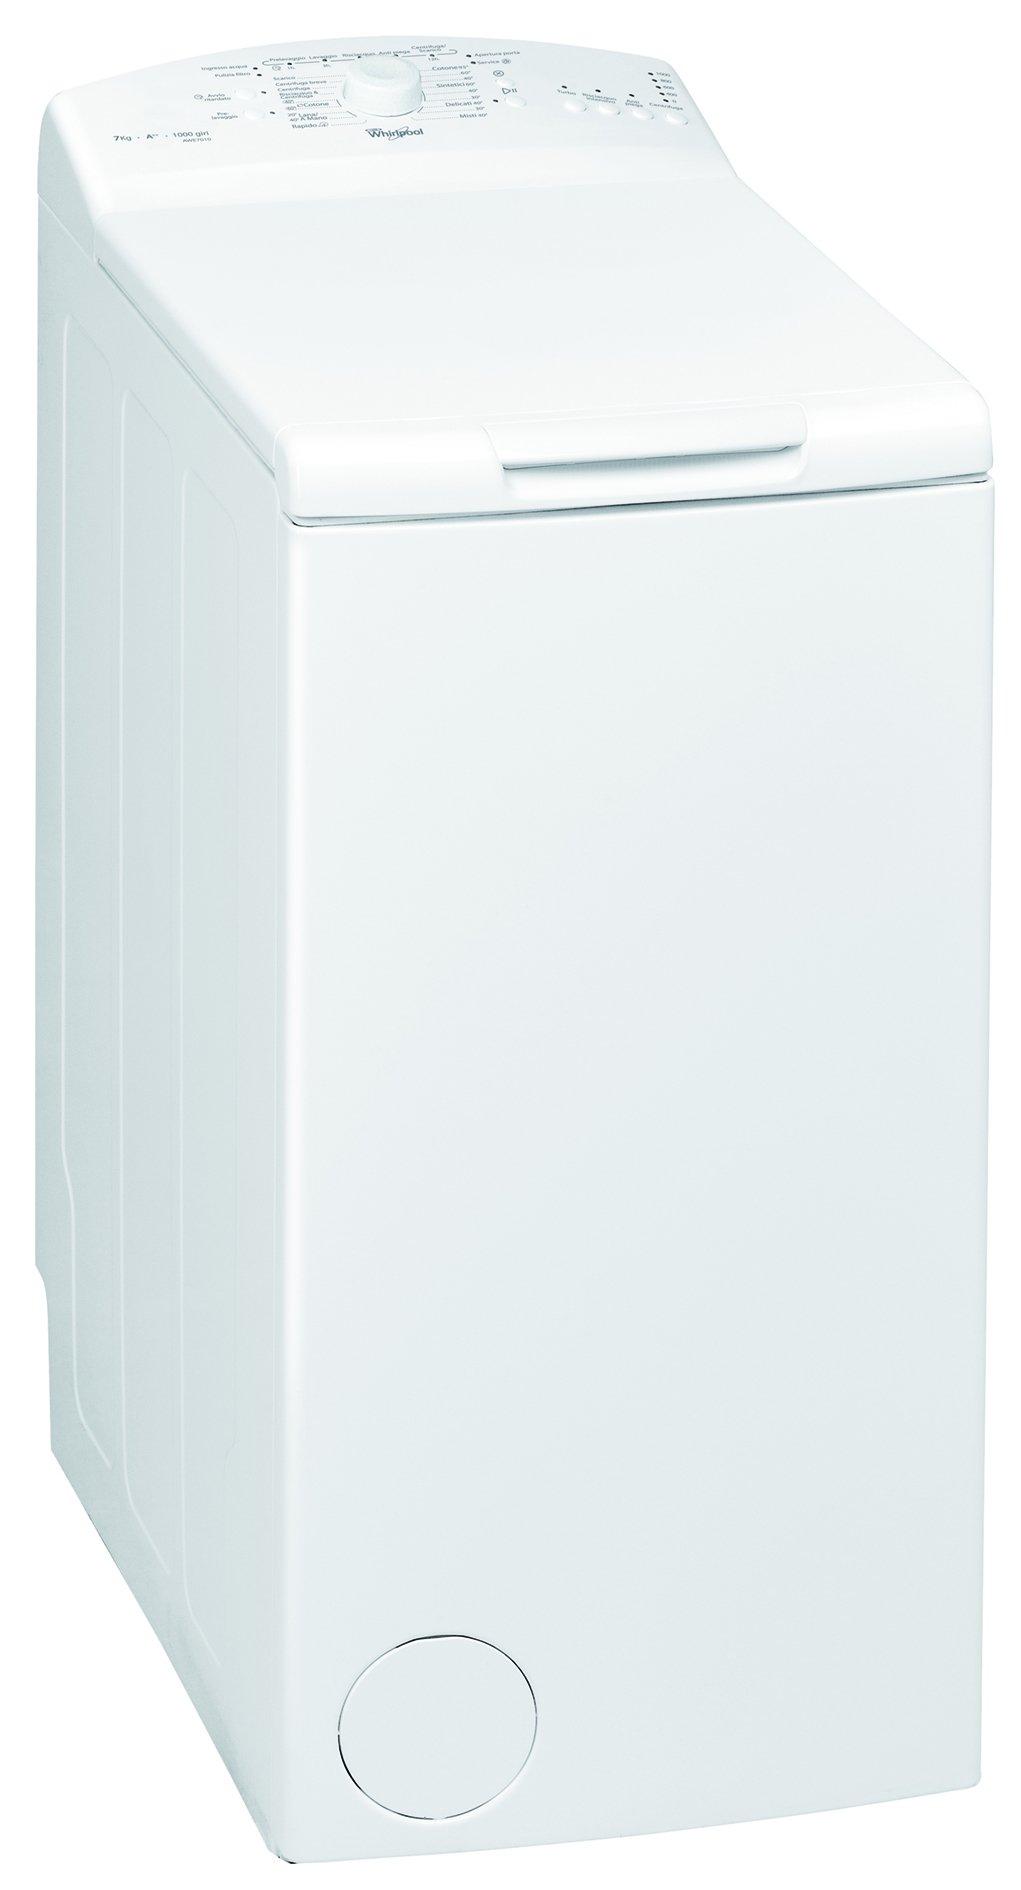 Whirlpool-Awe-7010-autonome-Ladekabel-Premium-7-kg-1000trmin-A-wei-Waschmaschine–Waschmaschinen-Ladekabel-autonome-Premium-wei-Knpfe-drehbar-oben-Wei